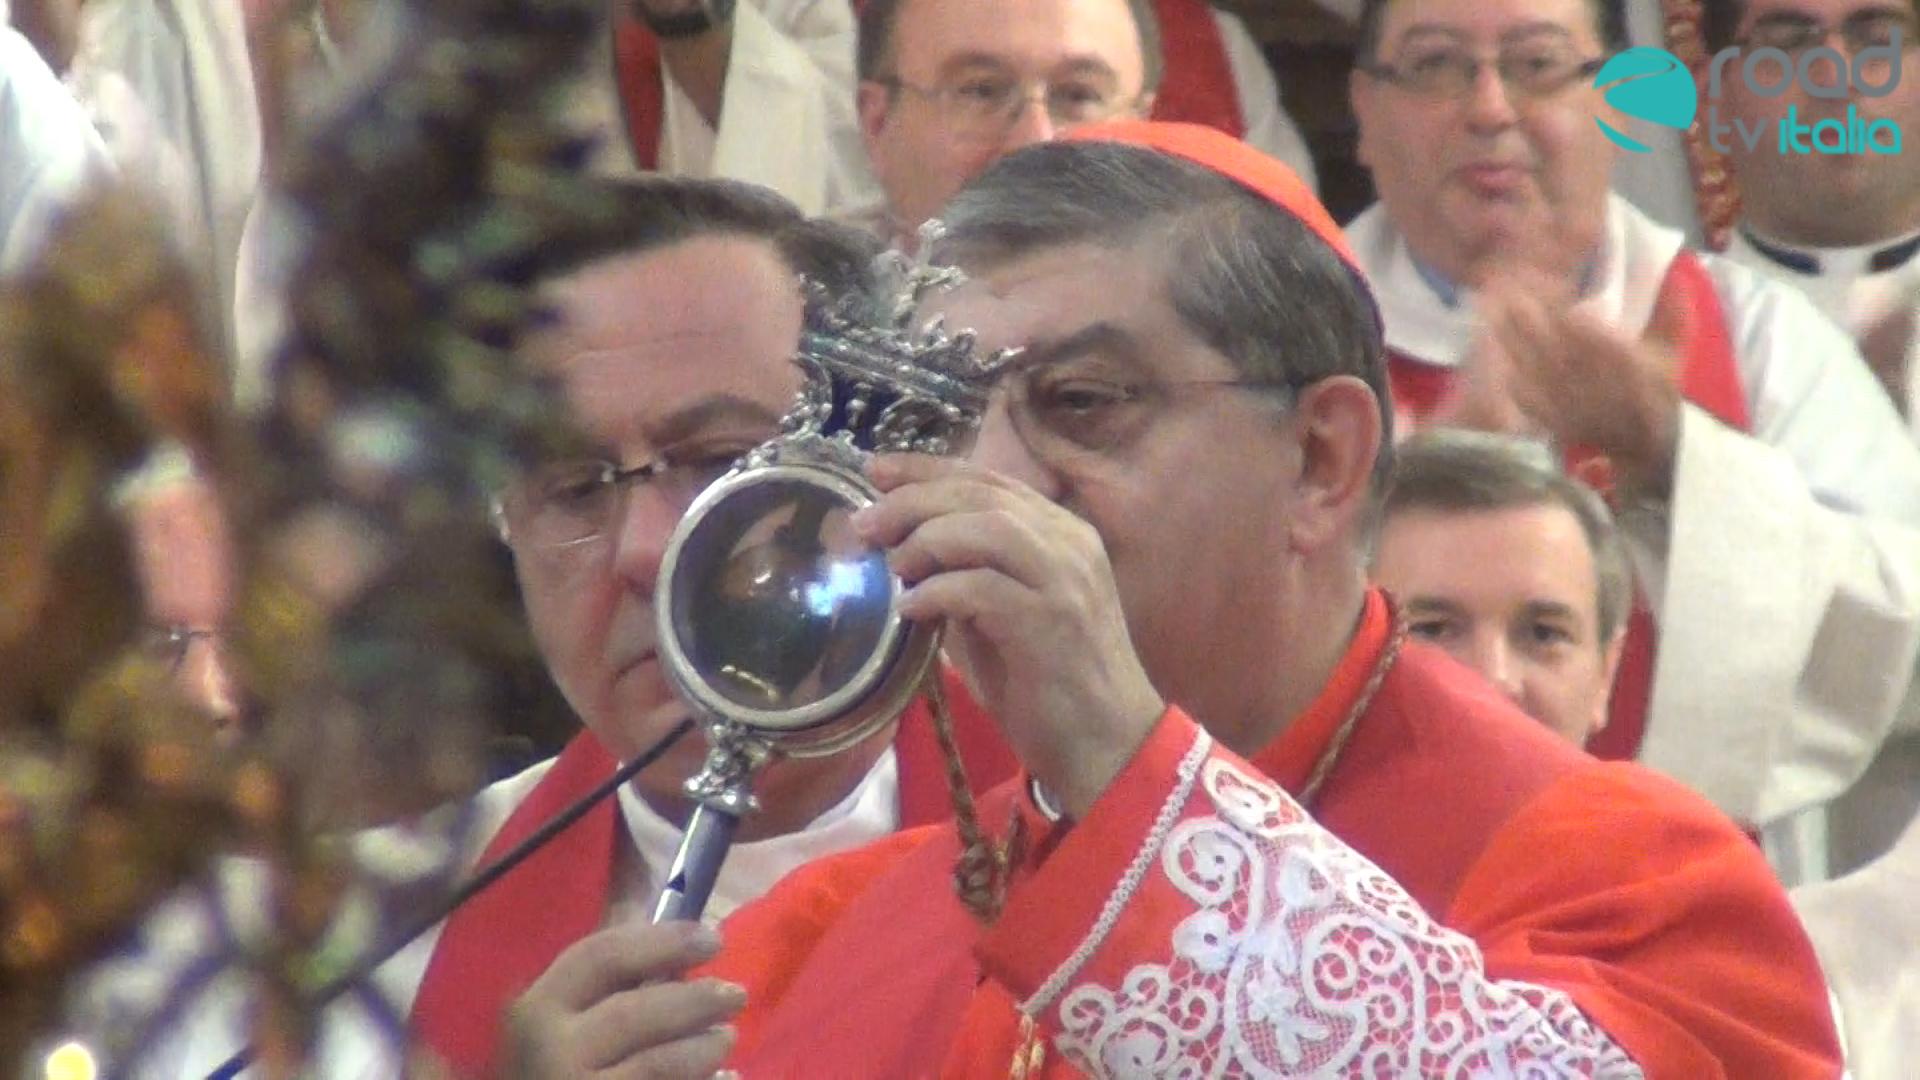 Speciale San Gennaro 2013 - Il miracolo del sangue (VIDEO)